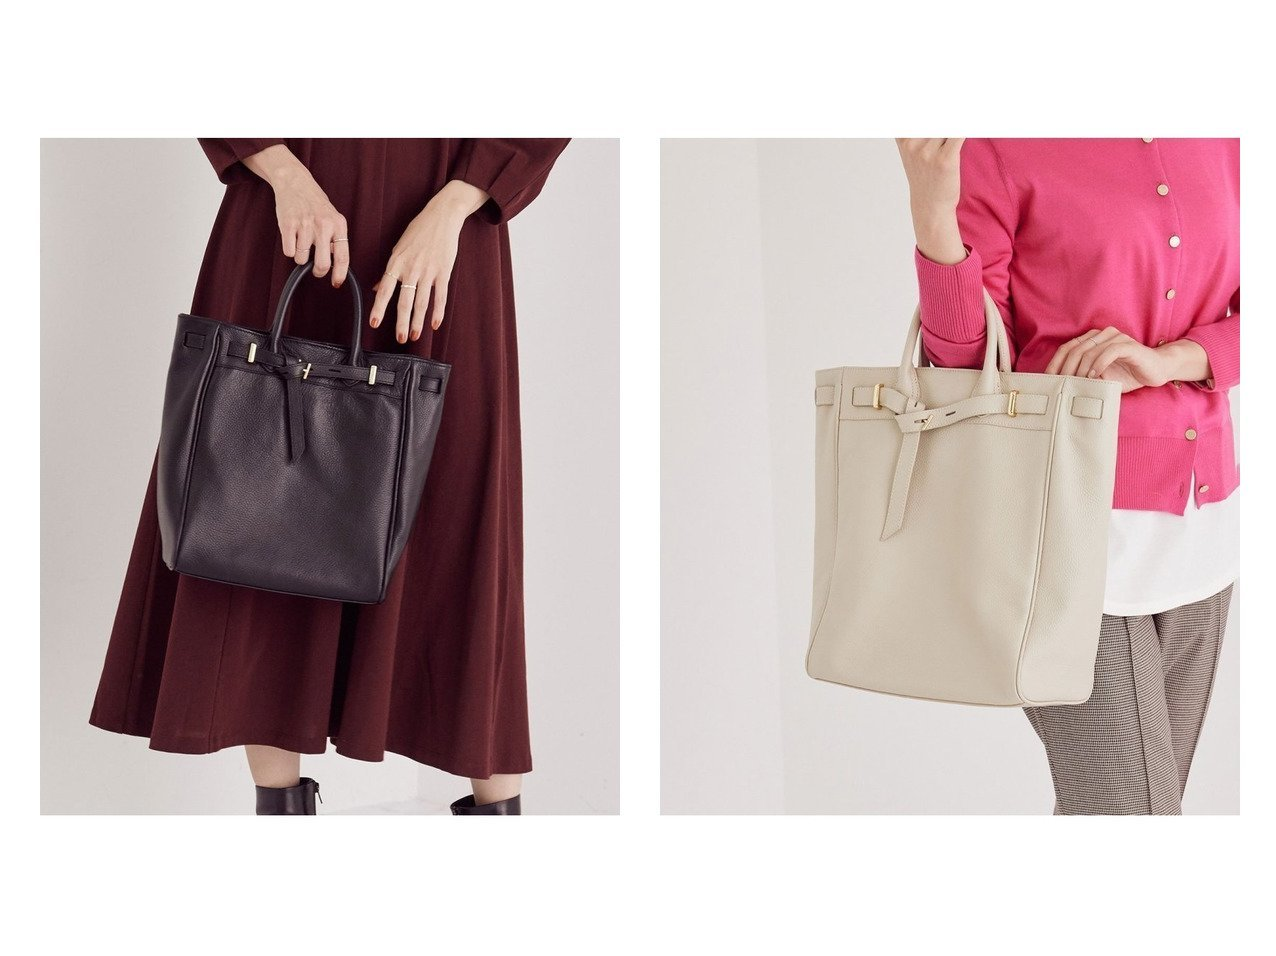 【ROPE/ロペ】の【新色追加】トグルベルトレザートートSサイズ&【新色追加】トグルベルトレザートート バッグ・鞄のおすすめ!人気、トレンド・レディースファッションの通販 おすすめで人気の流行・トレンド、ファッションの通販商品 メンズファッション・キッズファッション・インテリア・家具・レディースファッション・服の通販 founy(ファニー) https://founy.com/ ファッション Fashion レディースファッション WOMEN バッグ Bag ベルト Belts NEW・新作・新着・新入荷 New Arrivals トレンド フォルム 人気 |ID:crp329100000014158